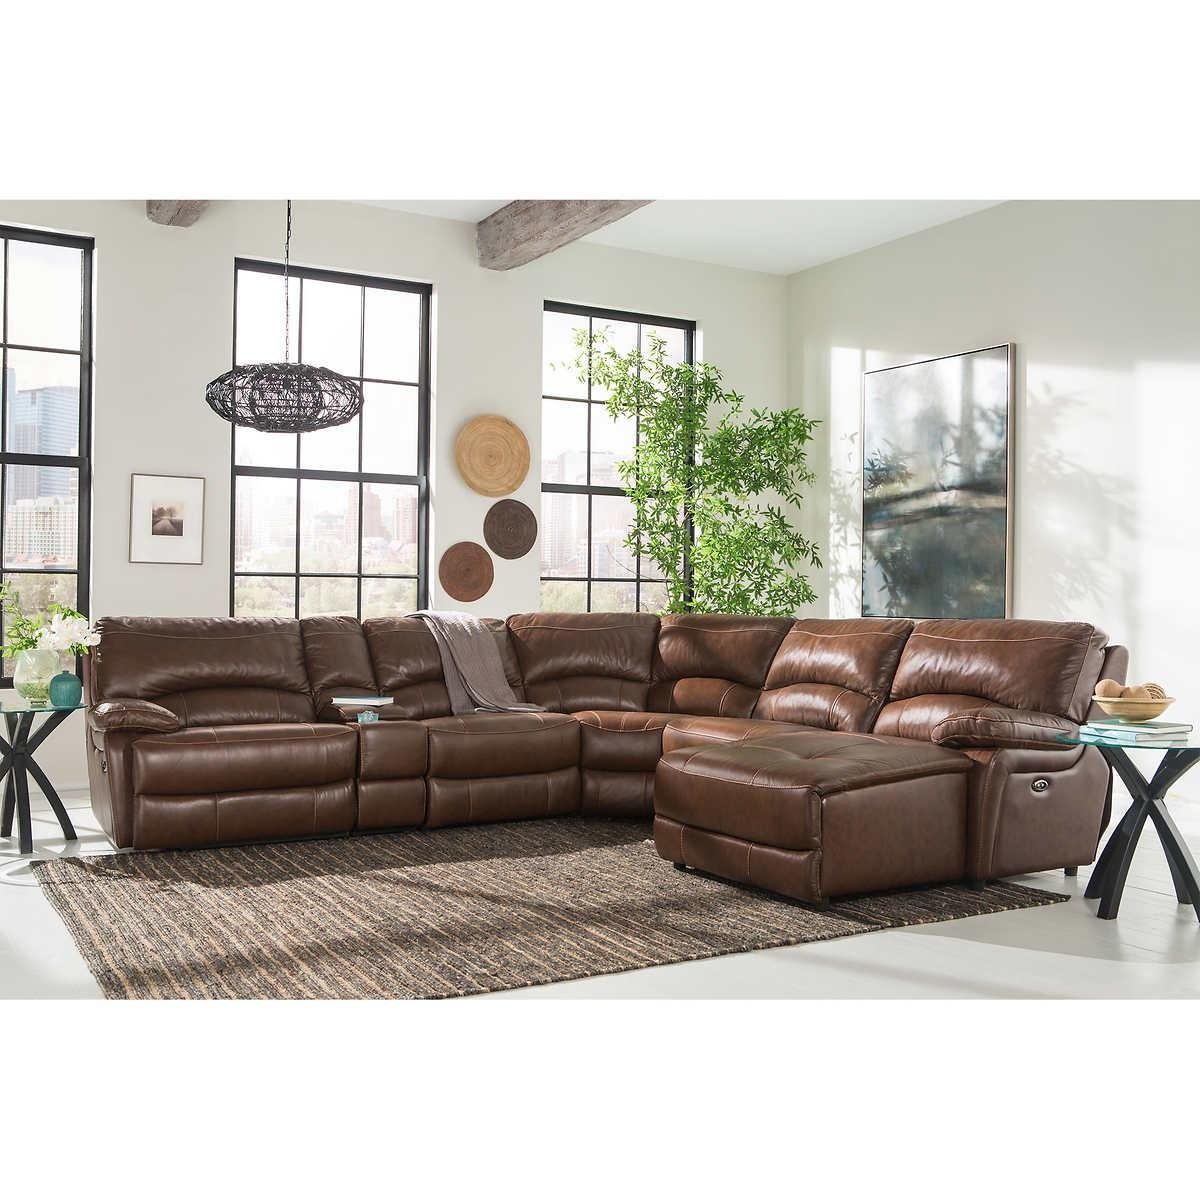 Modular Pit Group Sofa Amazing Modular Leather Sectional Sofa – Ftfpgh With Leather Modular Sectional Sofas (View 3 of 20)